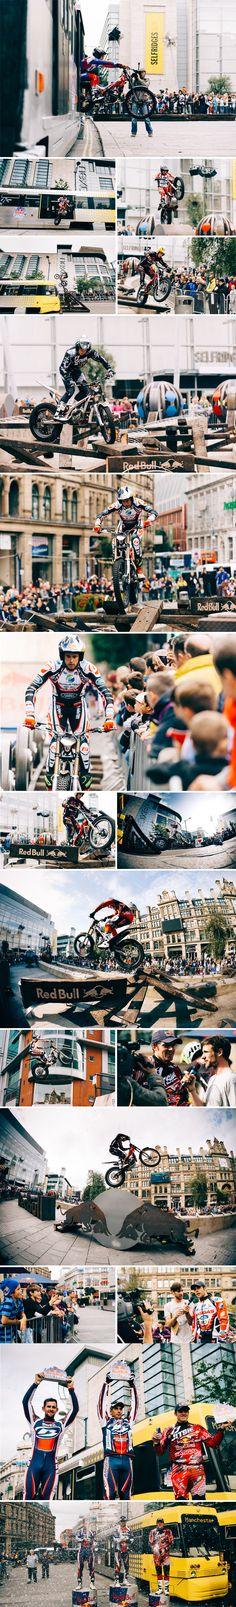 Red bull - Advertising photographer Manchester - Advertisement photography - PR photographer Manchester - PR photography #event #eventphotography #motorbike #piccadillygardens #redbull #extremesports #sportevents #sports #Printworks #Cornexchange #advertising #advert